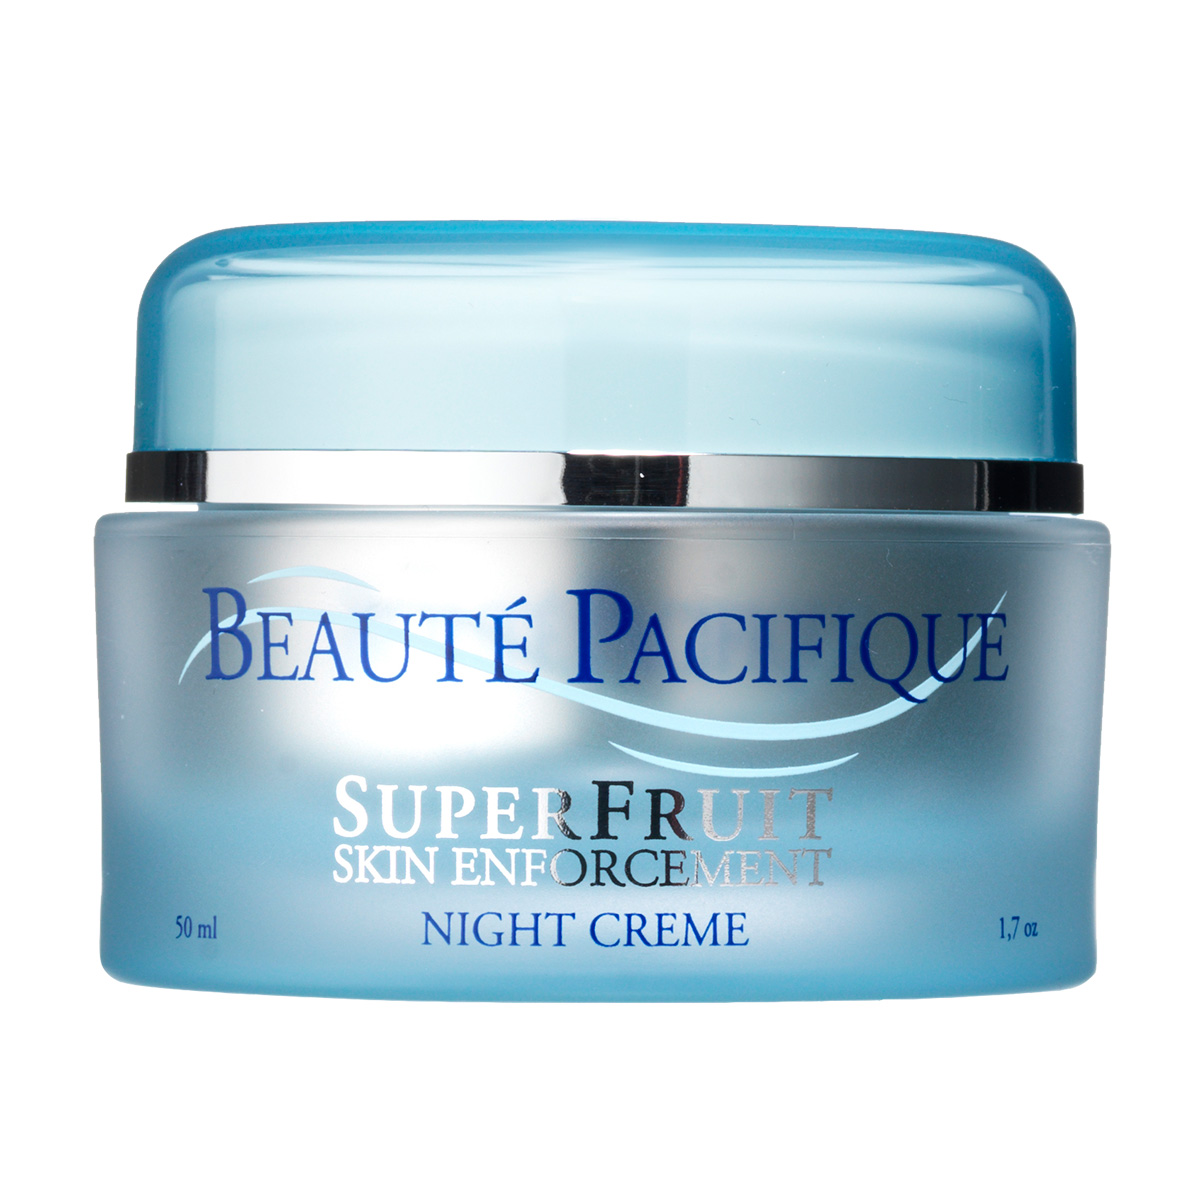 Billede af Beauté Pacifique SuperFruit Night Creme - 50 ml